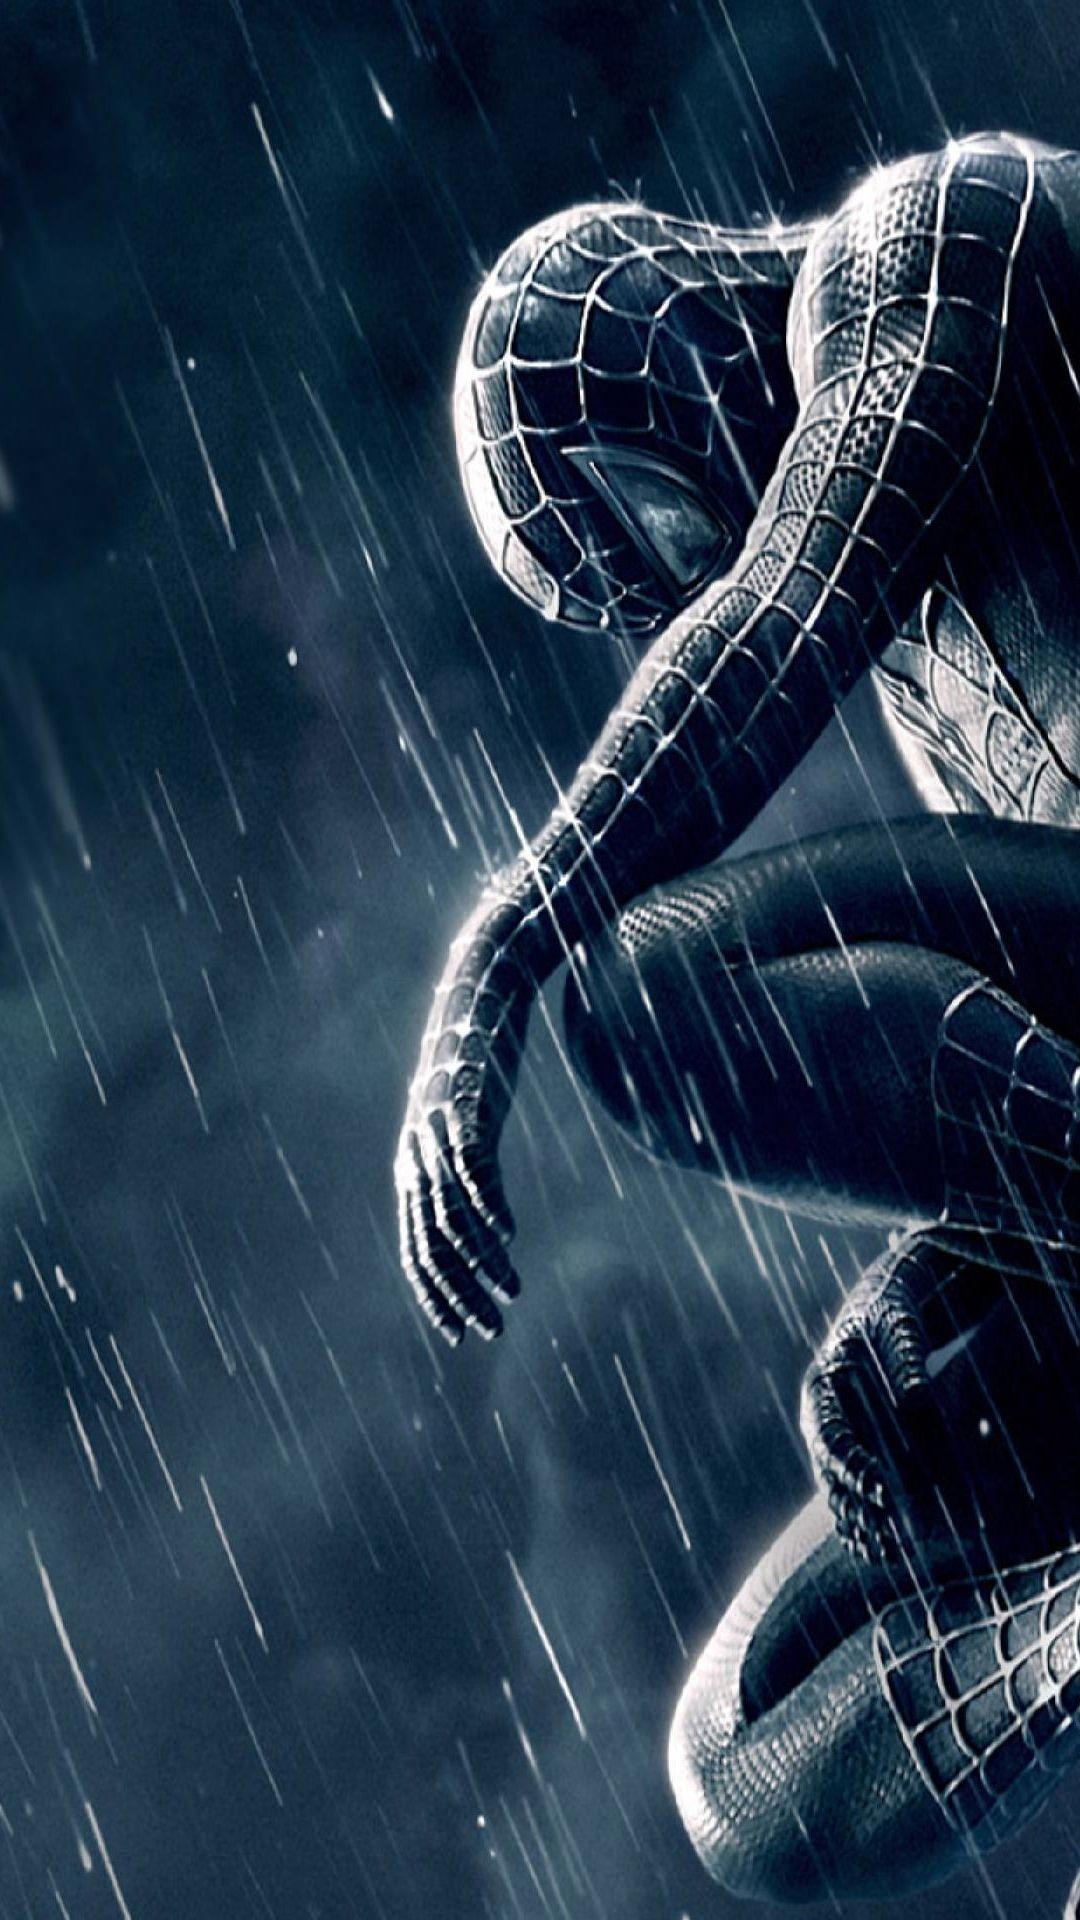 Spiderman Venom Wallpaper Posted By Samantha Cunningham